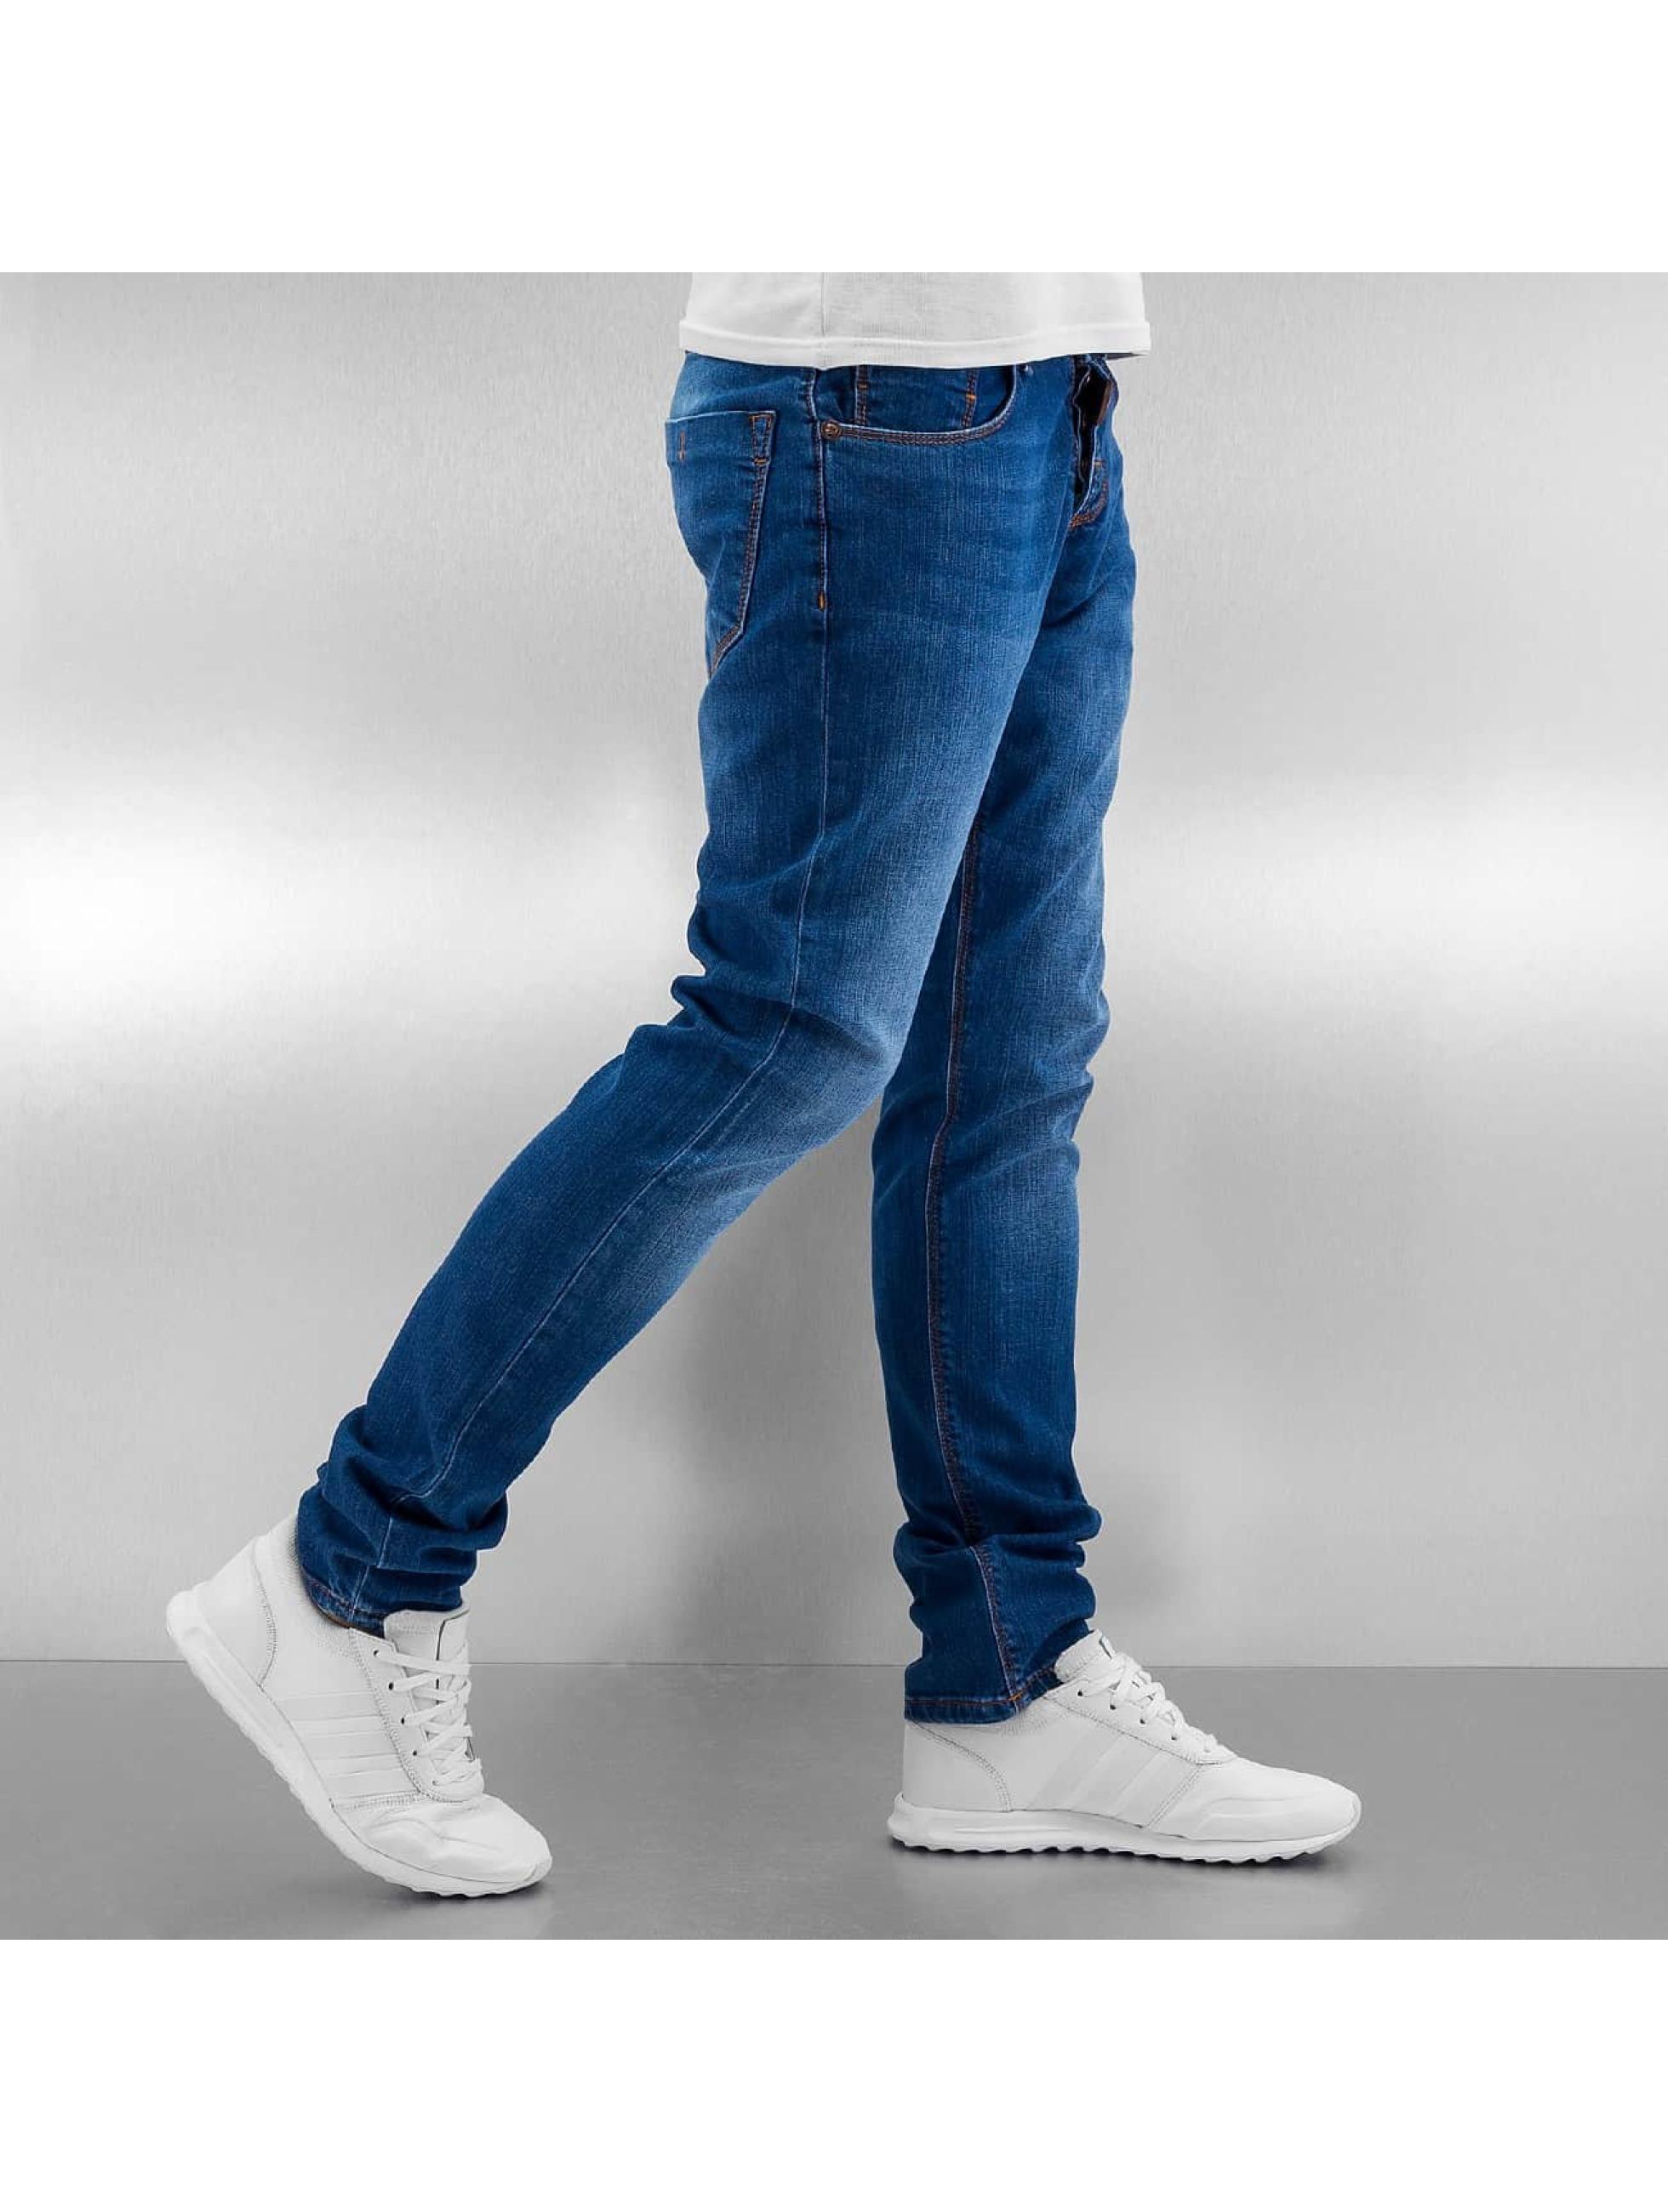 2Y Skinny Jeans Haki blue